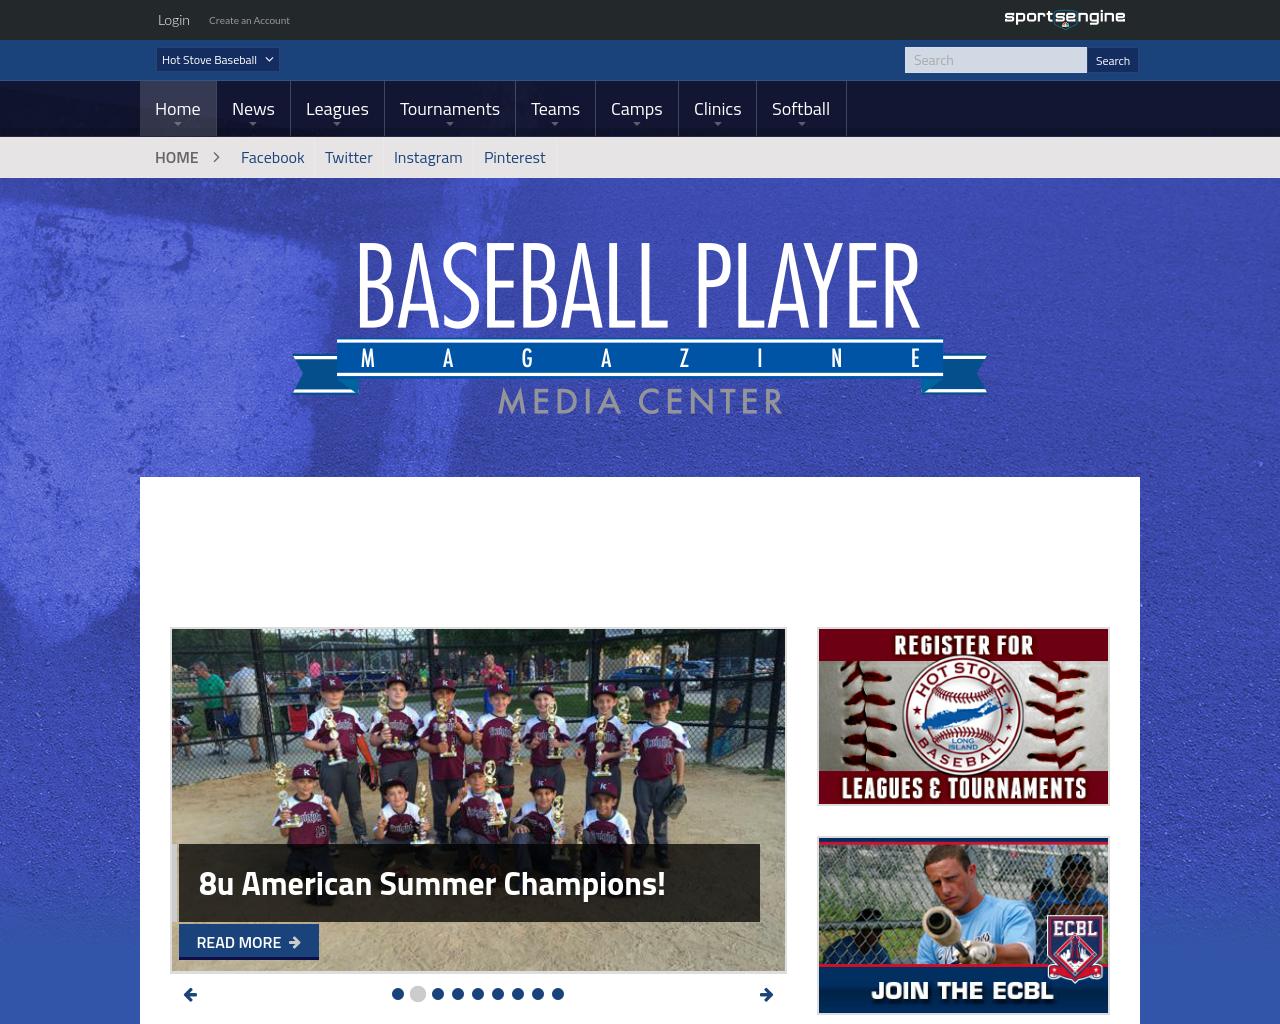 Baseball-Player-Magazine-Advertising-Reviews-Pricing